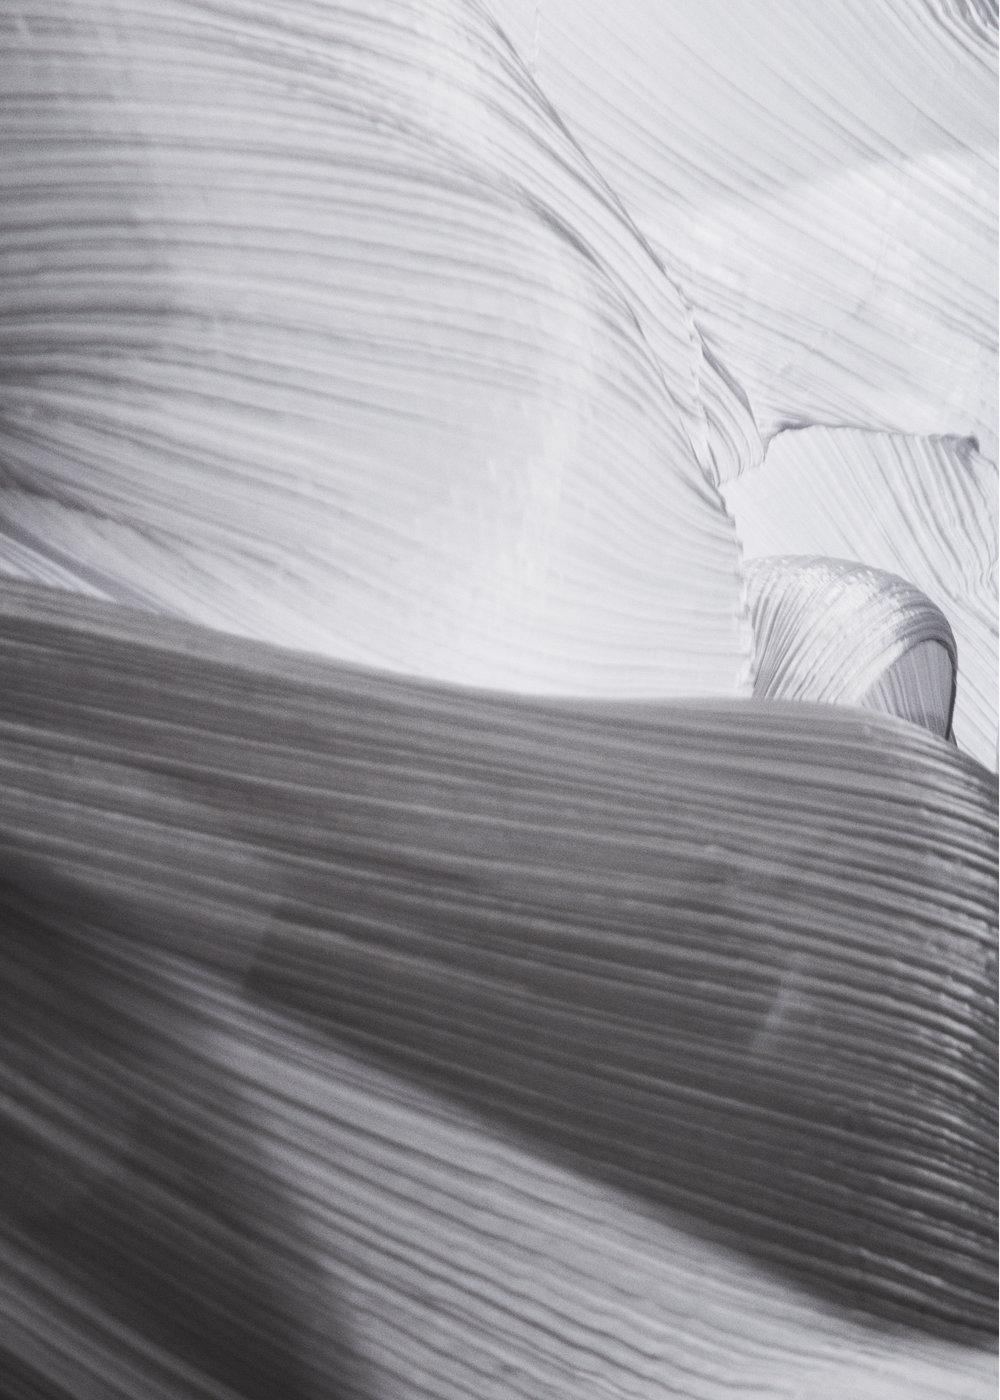 Totokaelo-FabricStory-1.jpg